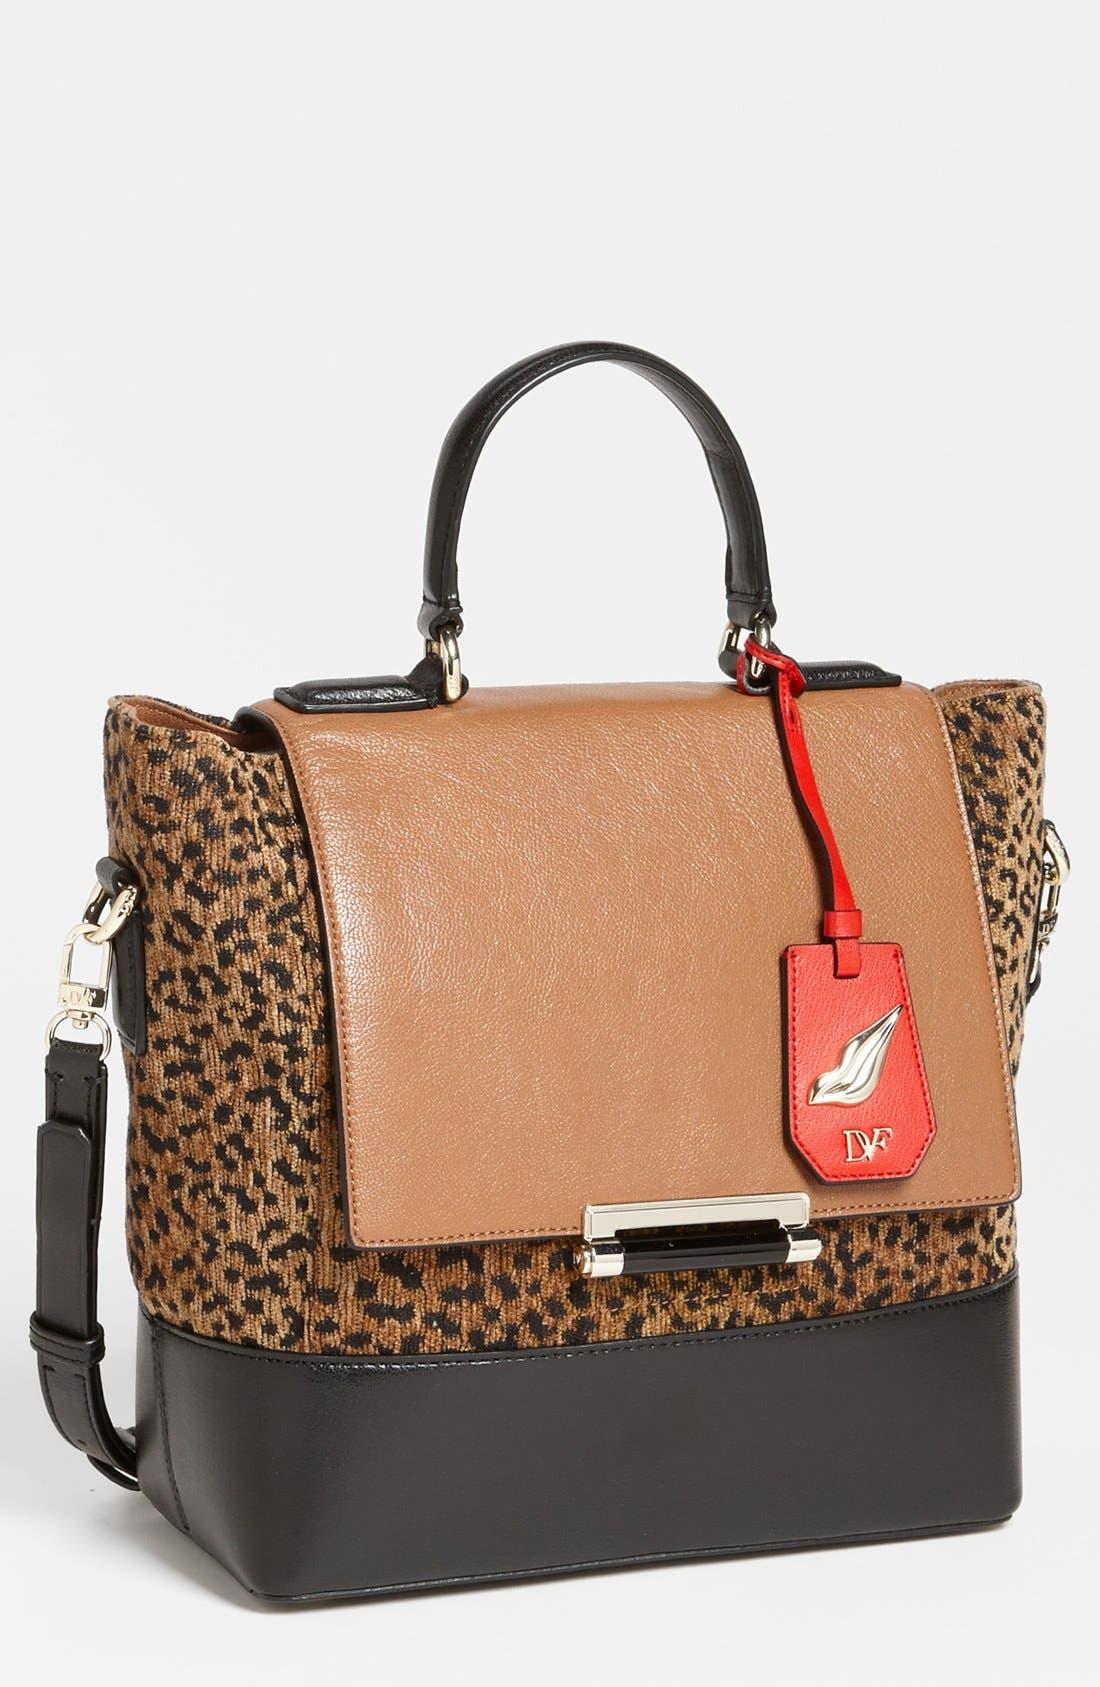 Alternate Image 1 Selected - Diane von Furstenberg '440 Top Handle - Small' Leopard Jacquard Satchel